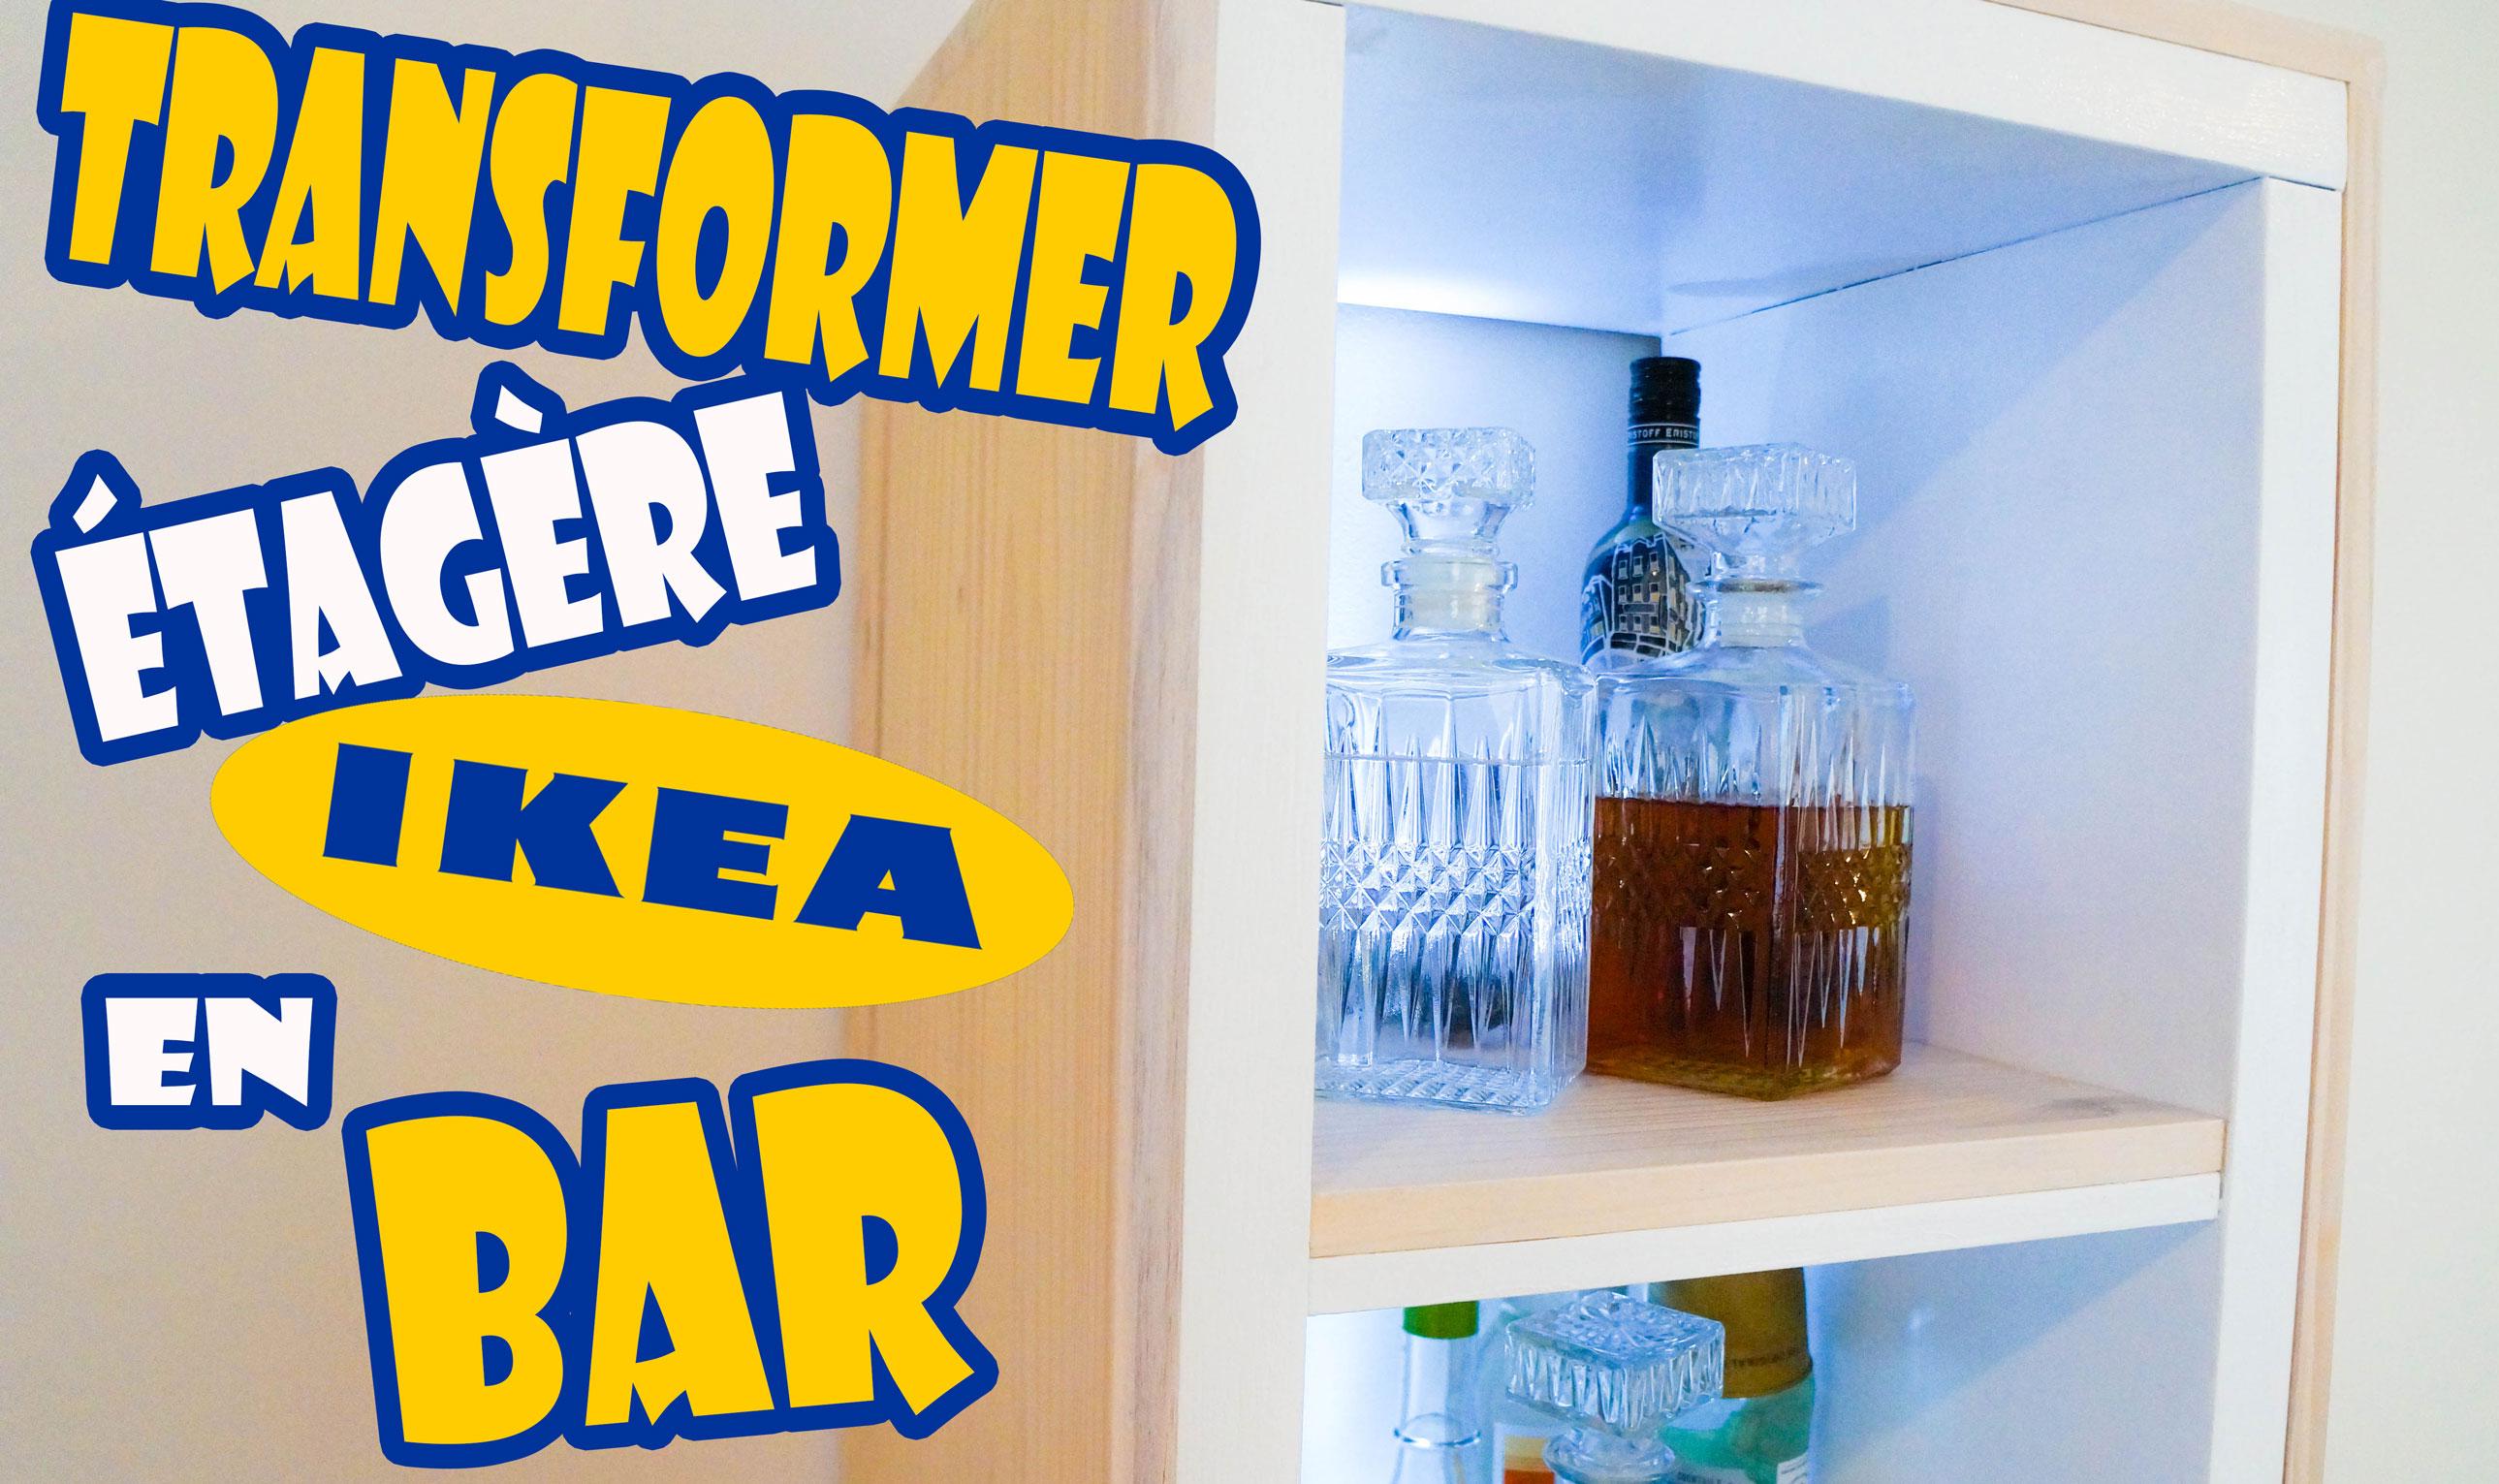 Comment transformer un meuble ikea en bar chadi chabib - Meuble bar ikea ...